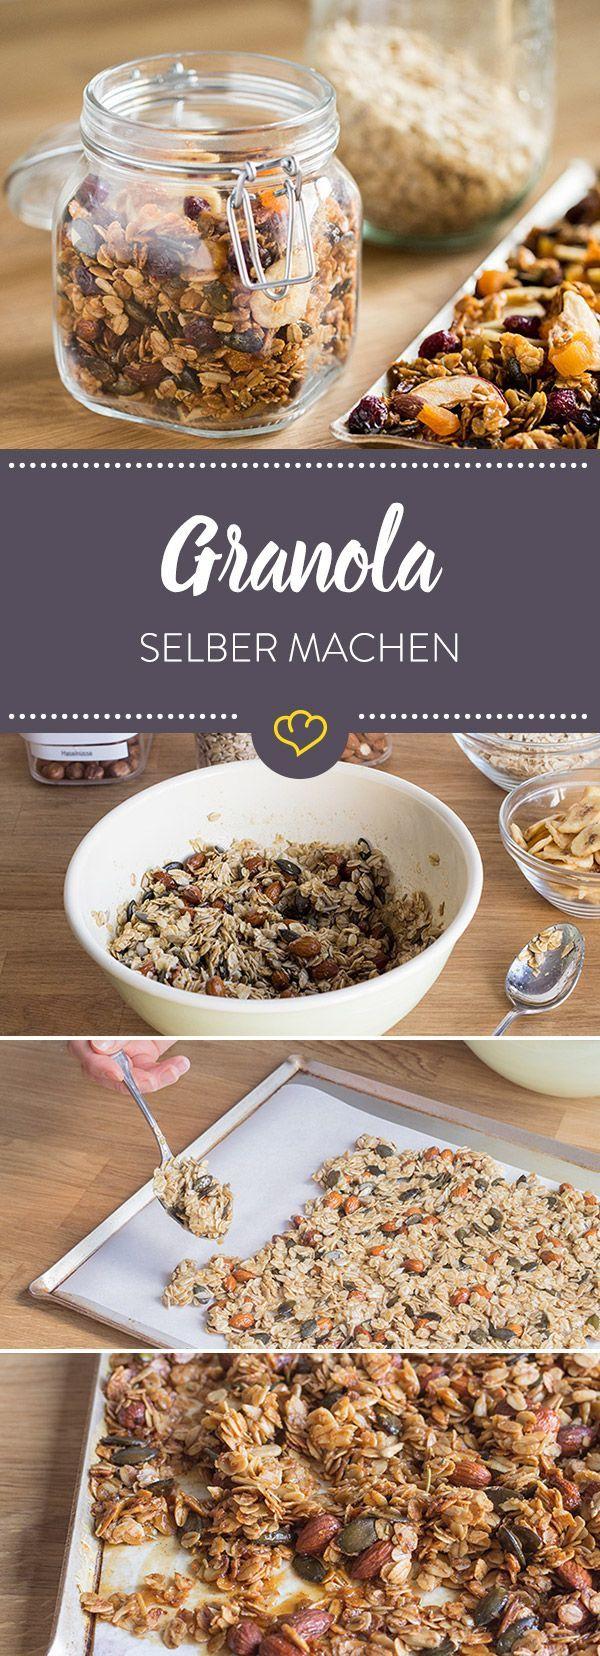 granola selber machen rezept rezepte. Black Bedroom Furniture Sets. Home Design Ideas